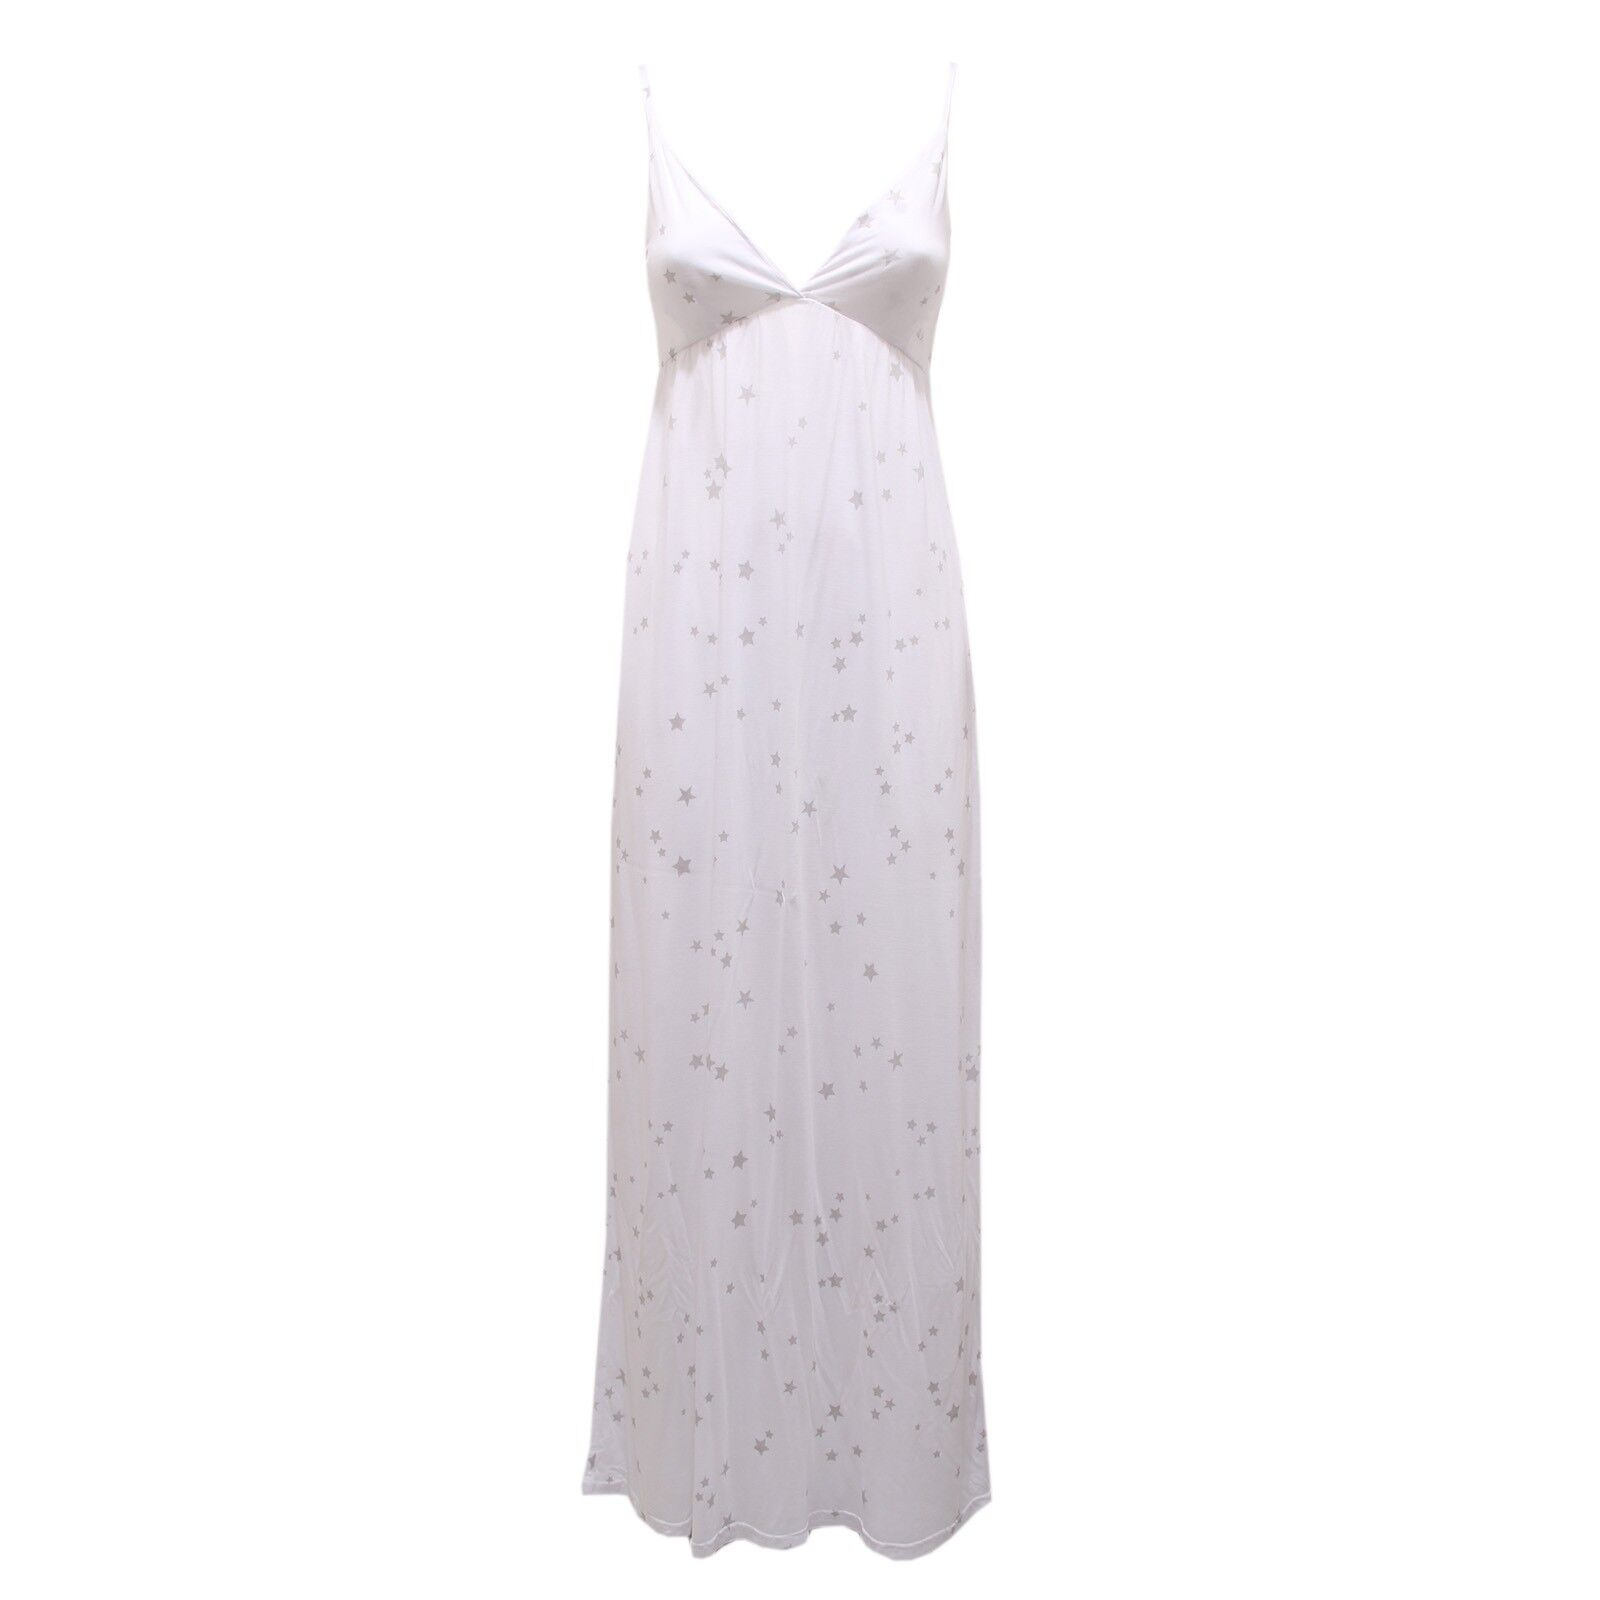 8258S 8258S 8258S abito SUN 68 bianco Silber smanicato dress sleeveless woman c110d2